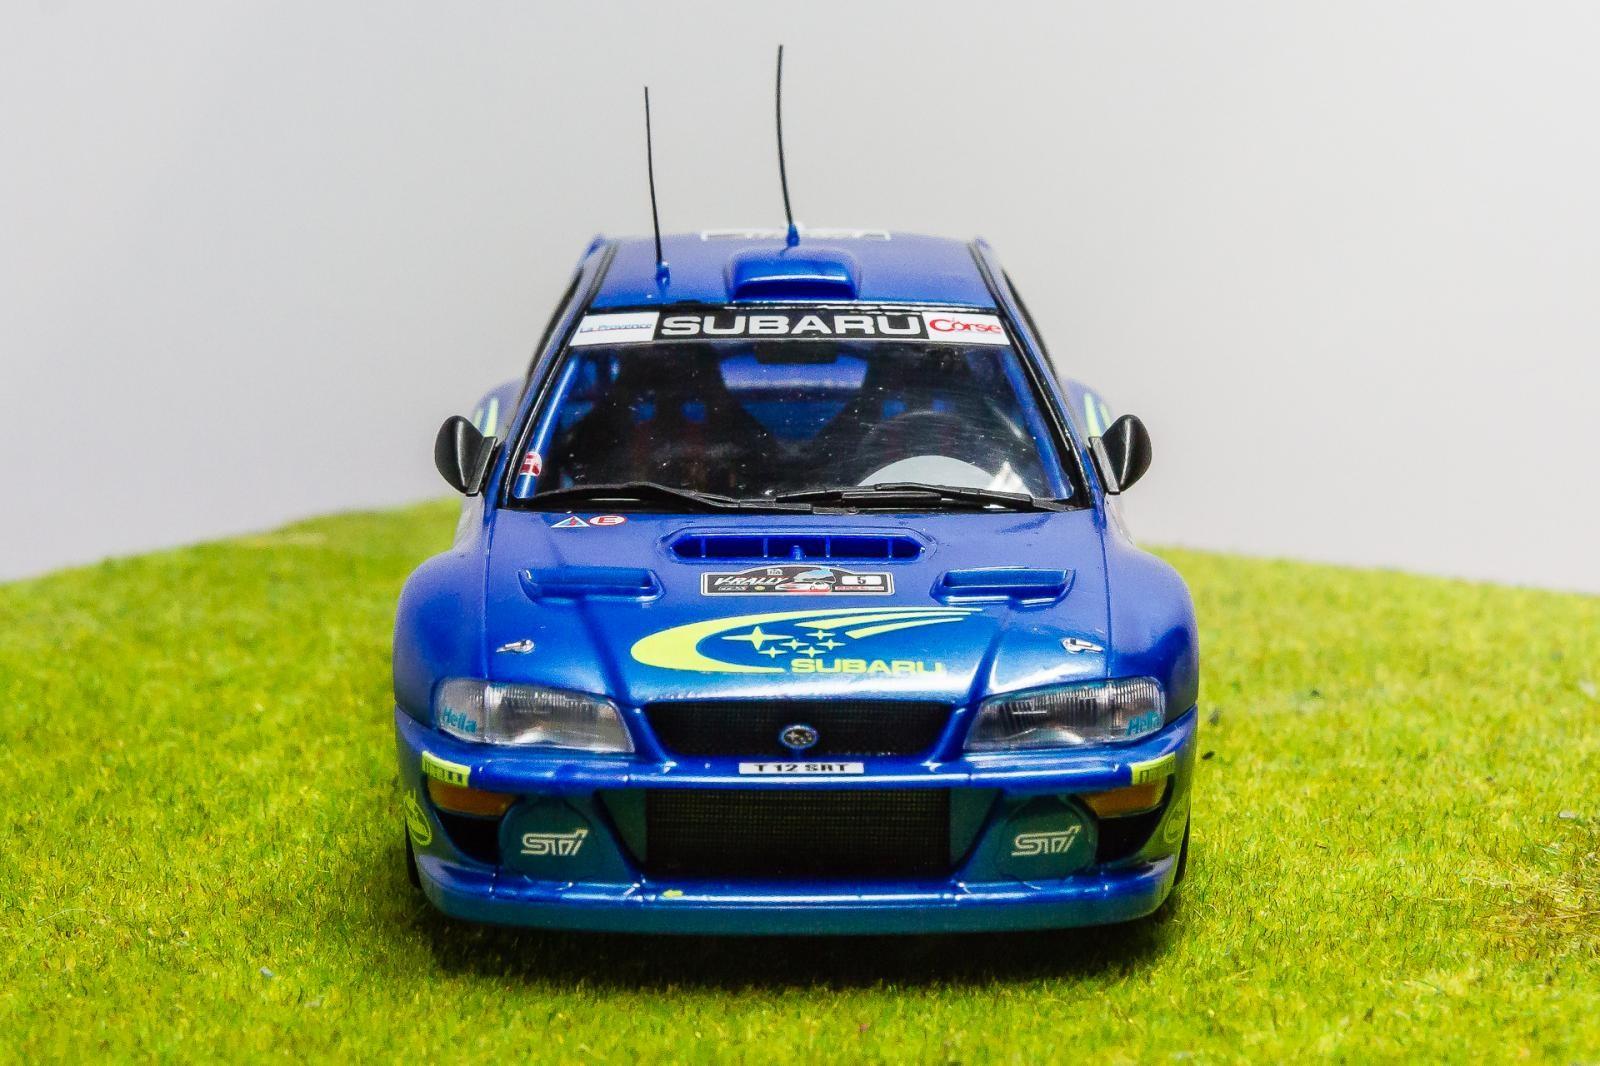 Tamiya 1 24 Scale Subaru Impreza Wrc 99 Imodeler